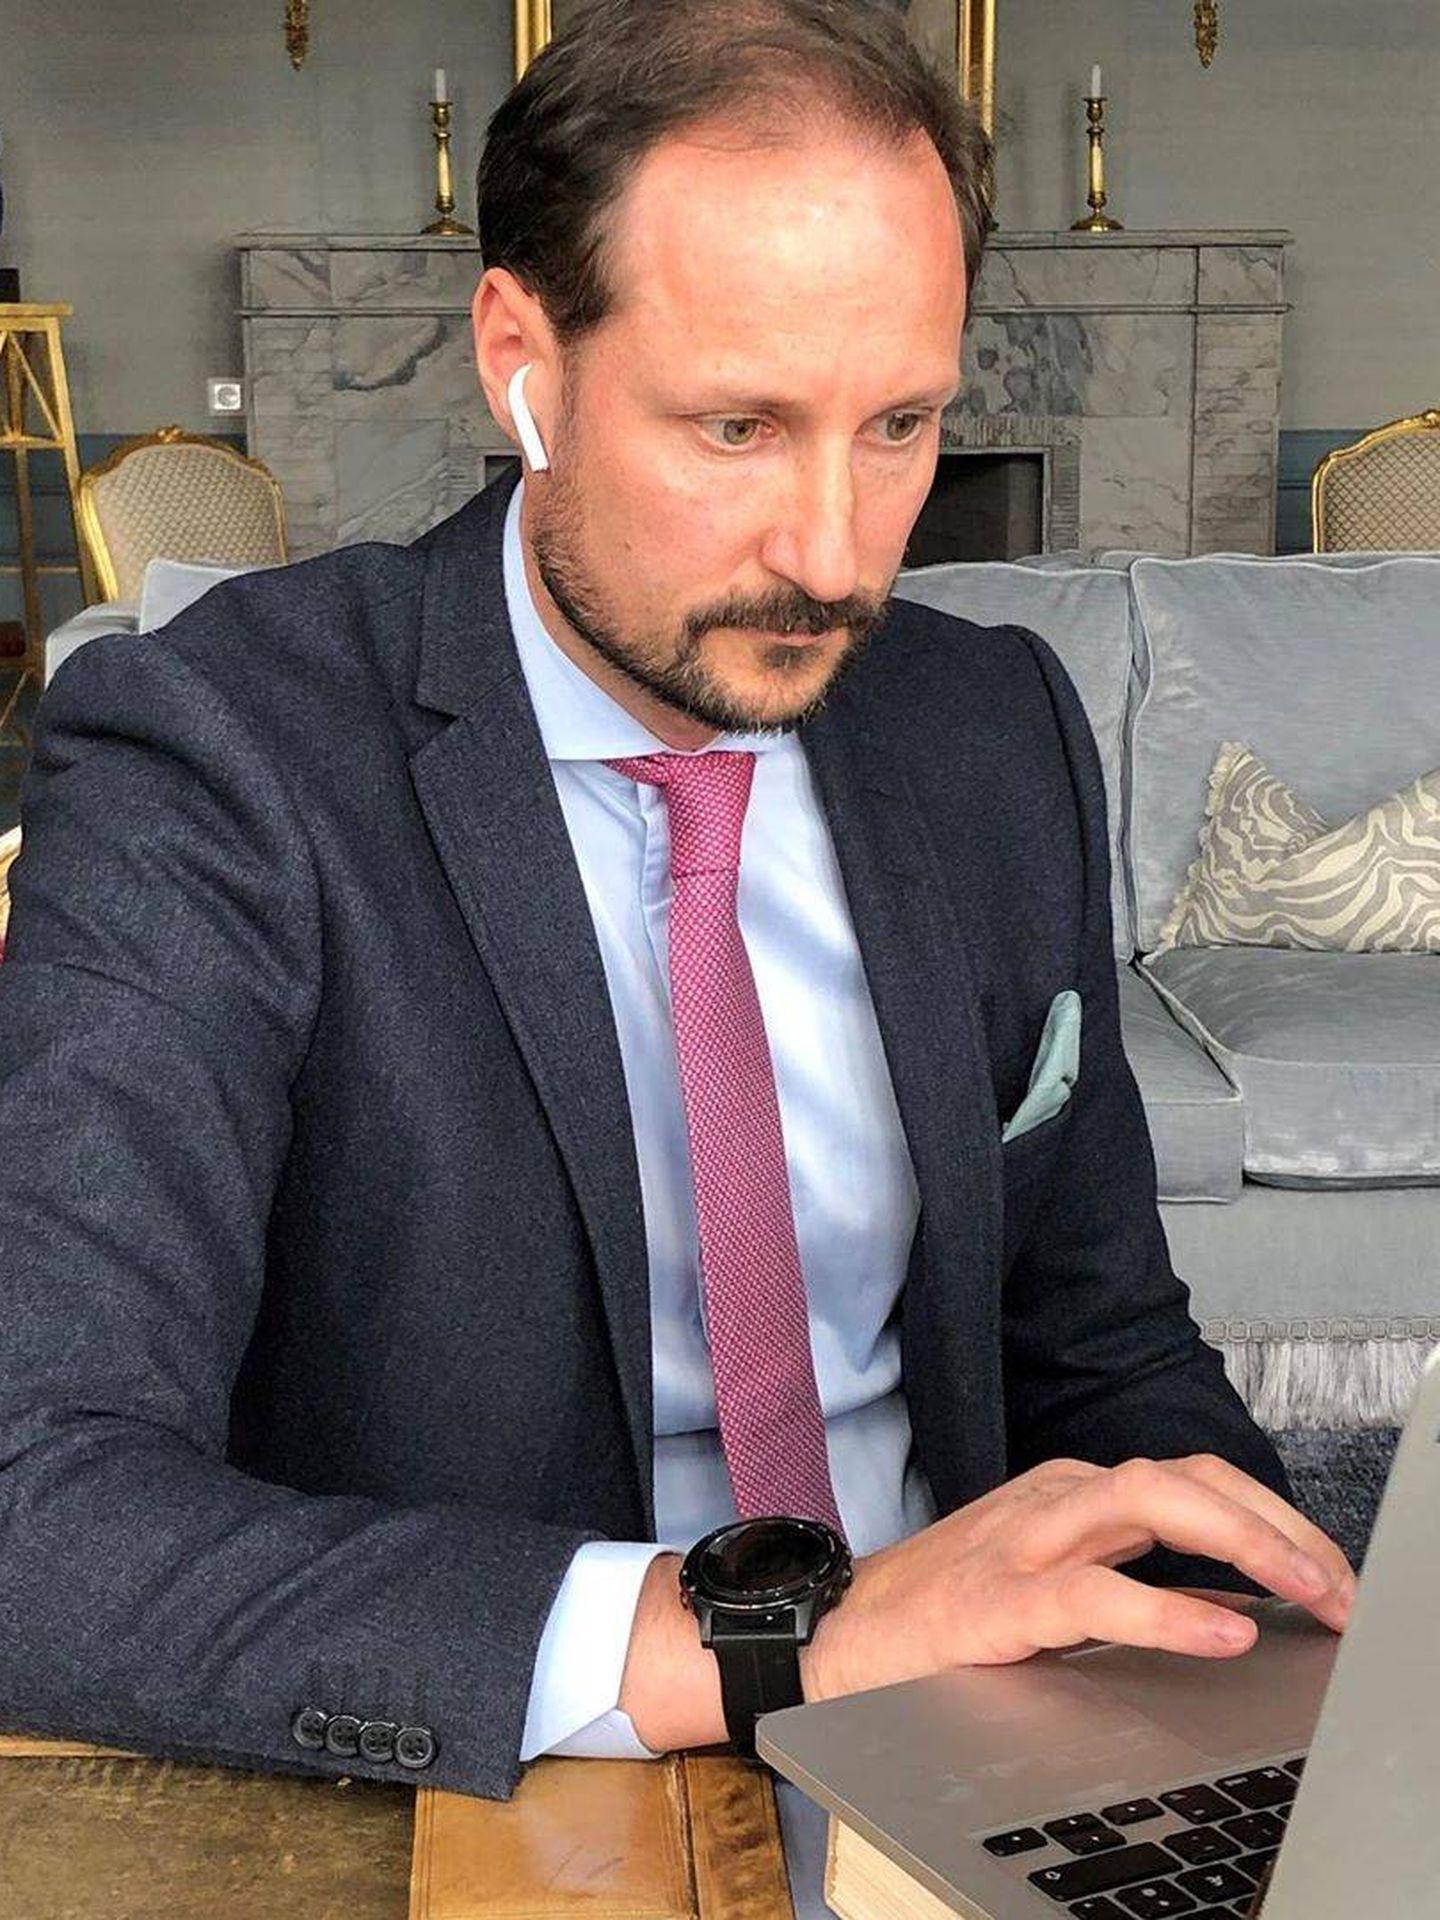 Haakon de Noruega. (@detnorskekongehus)